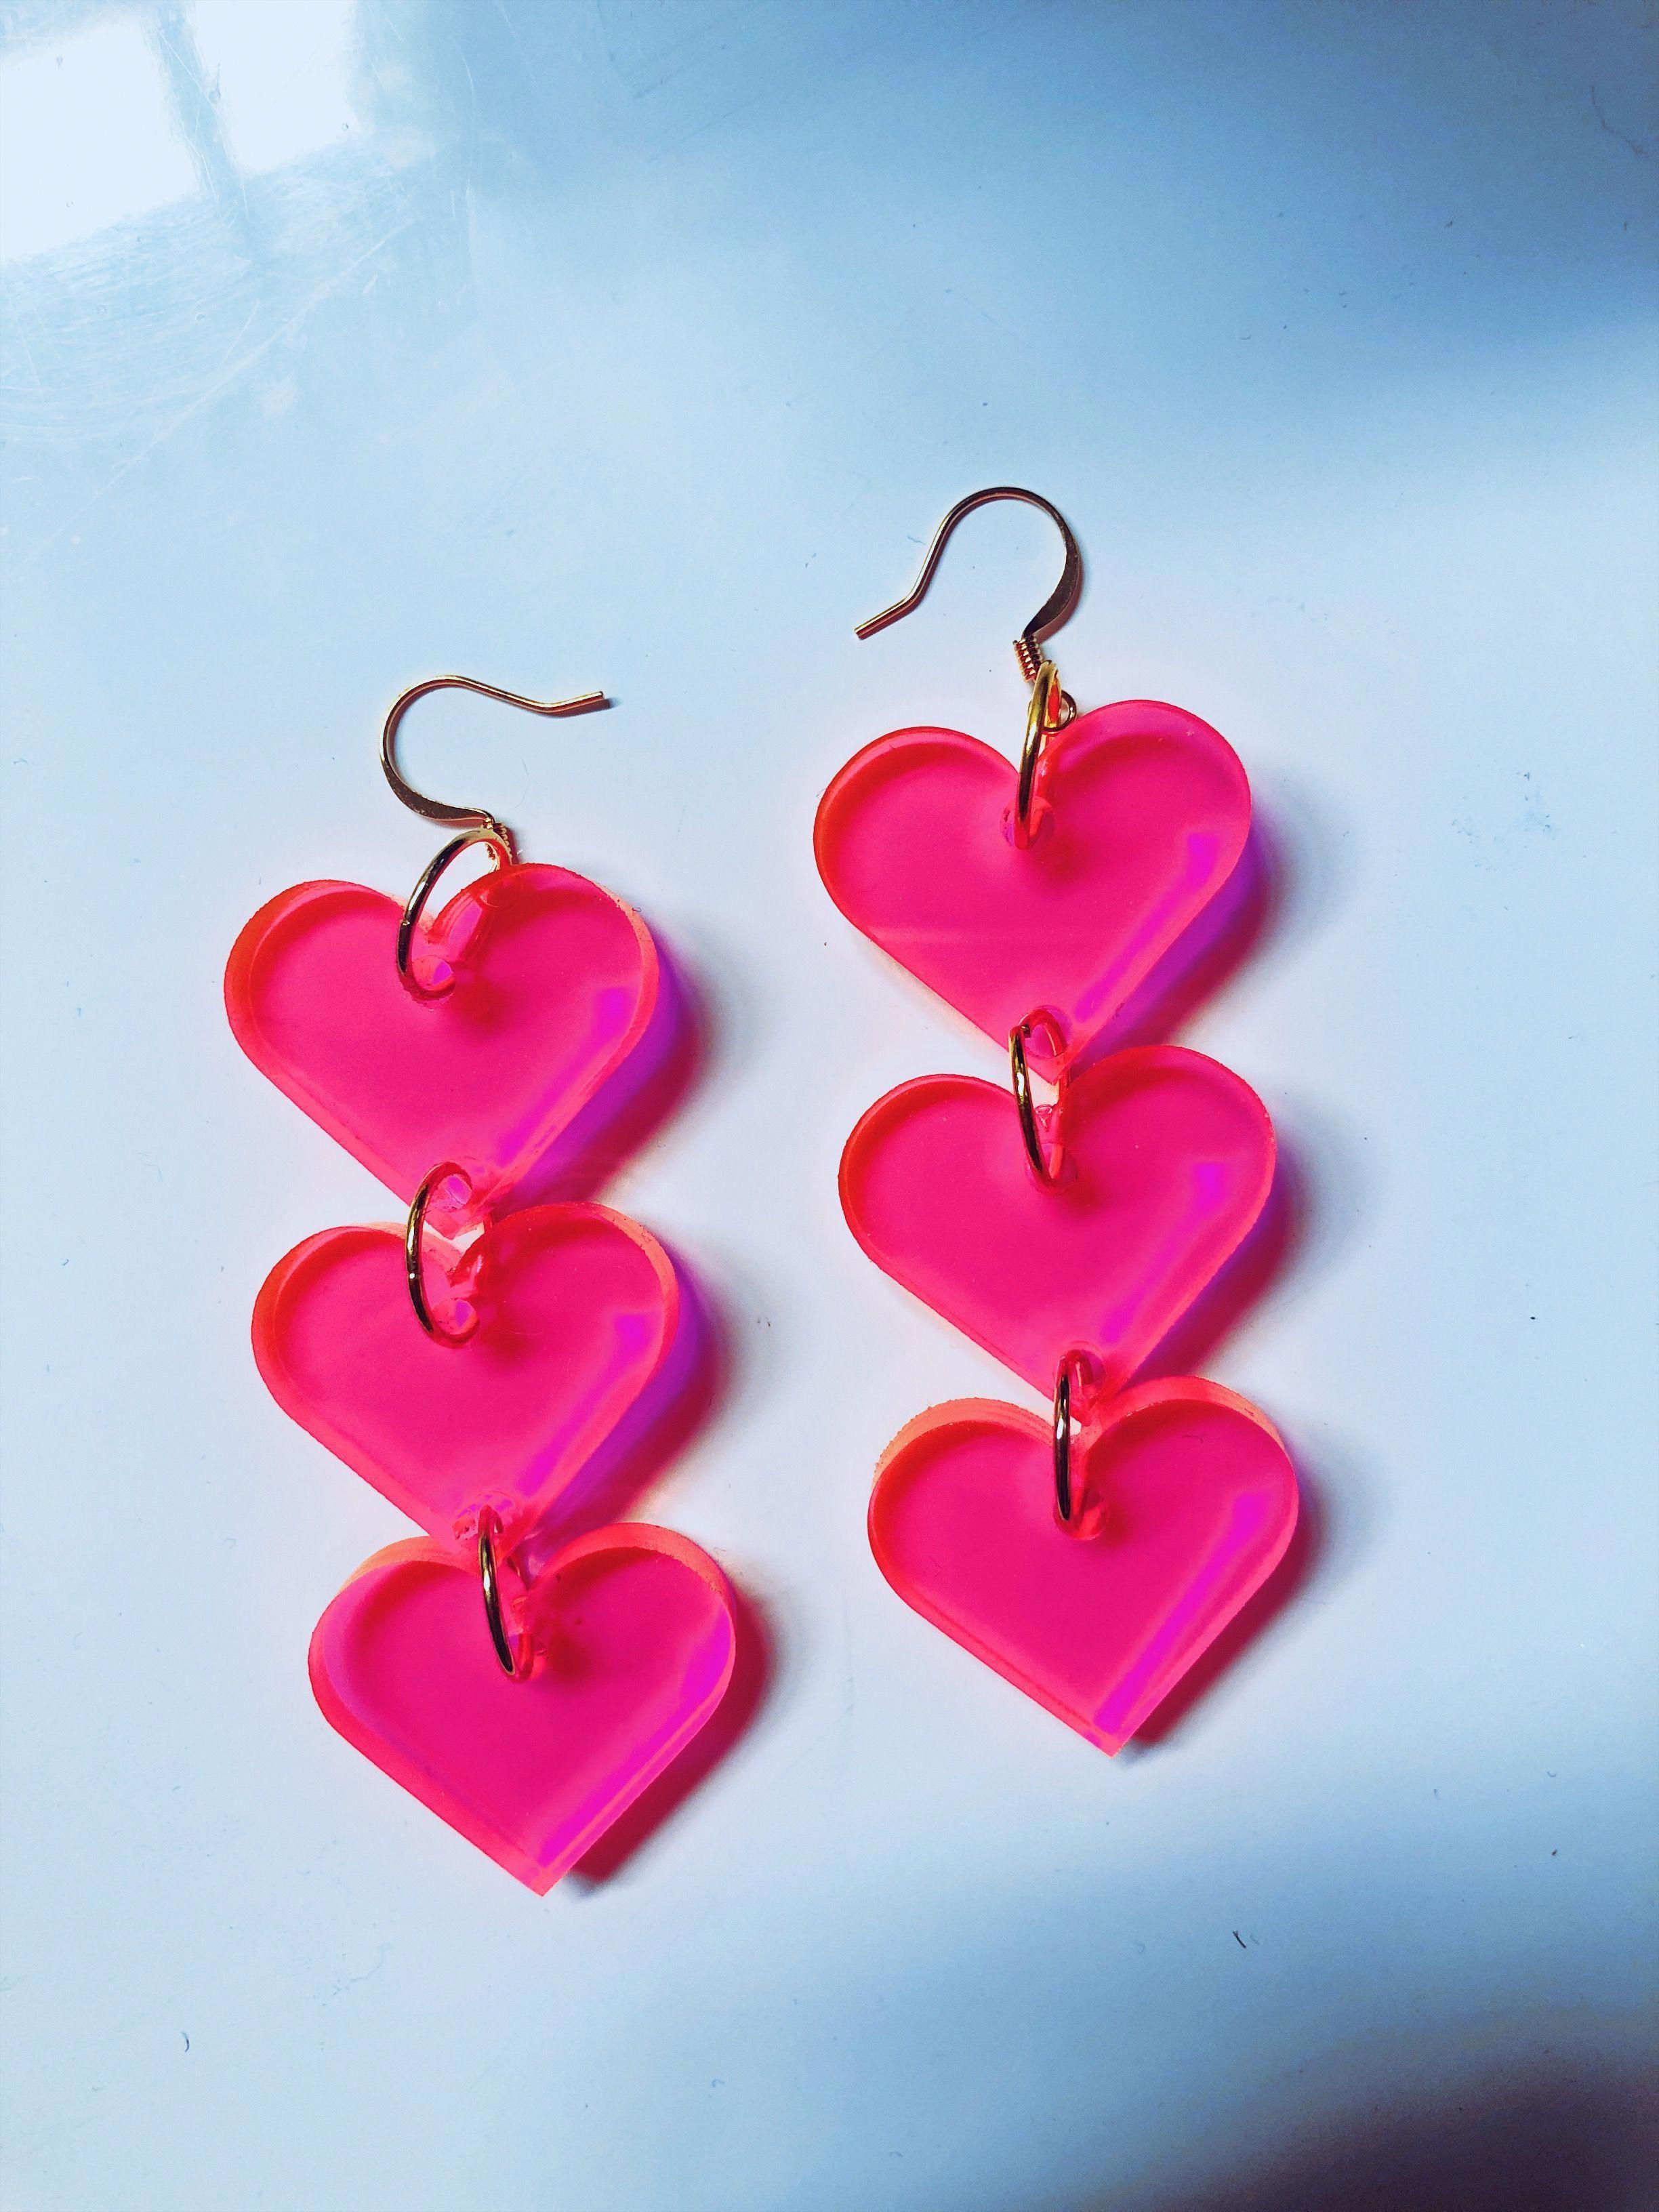 Fluoro Pink Sweetness Statement Dangles Acrylic Earrings